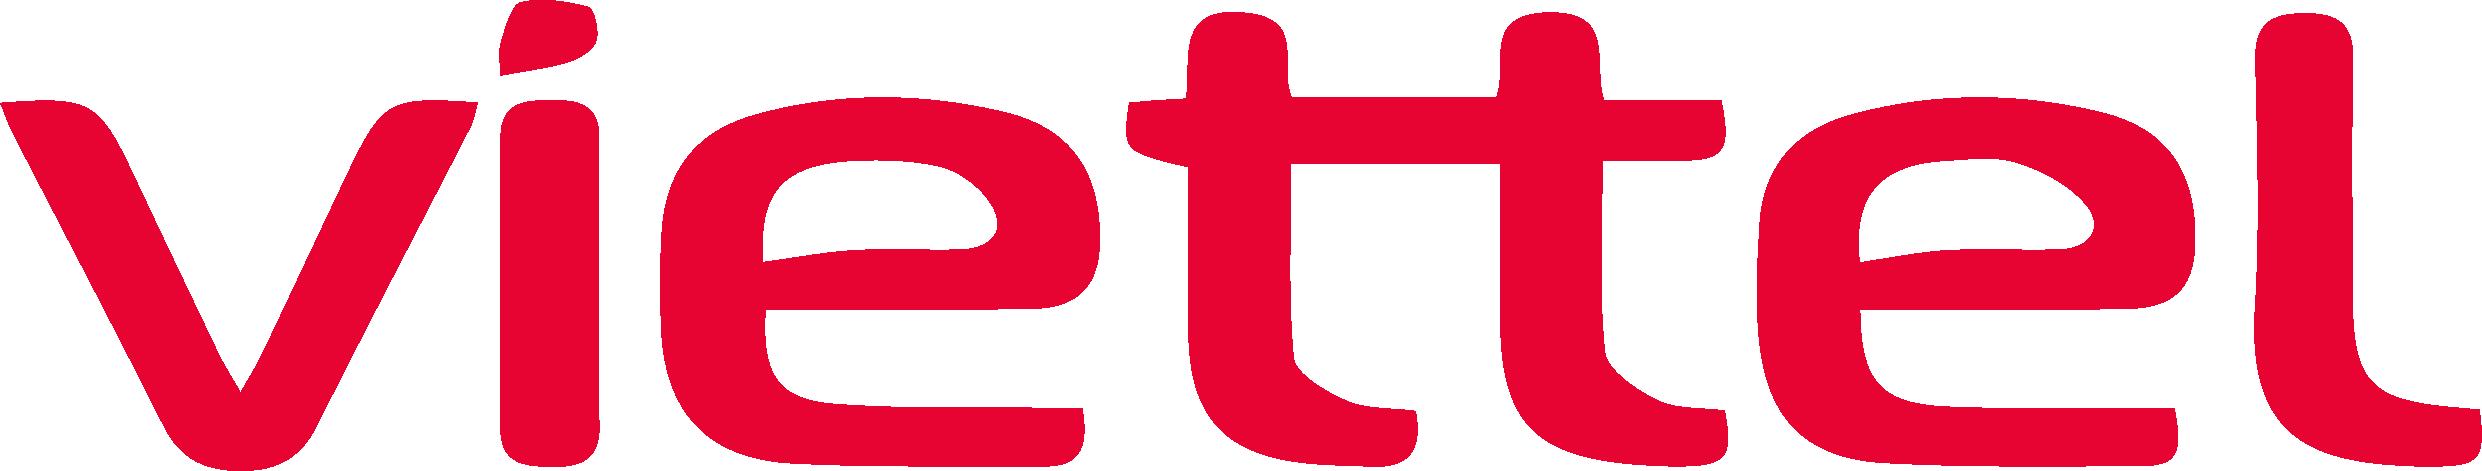 Logo Viettel Thegioigoicuoc 02